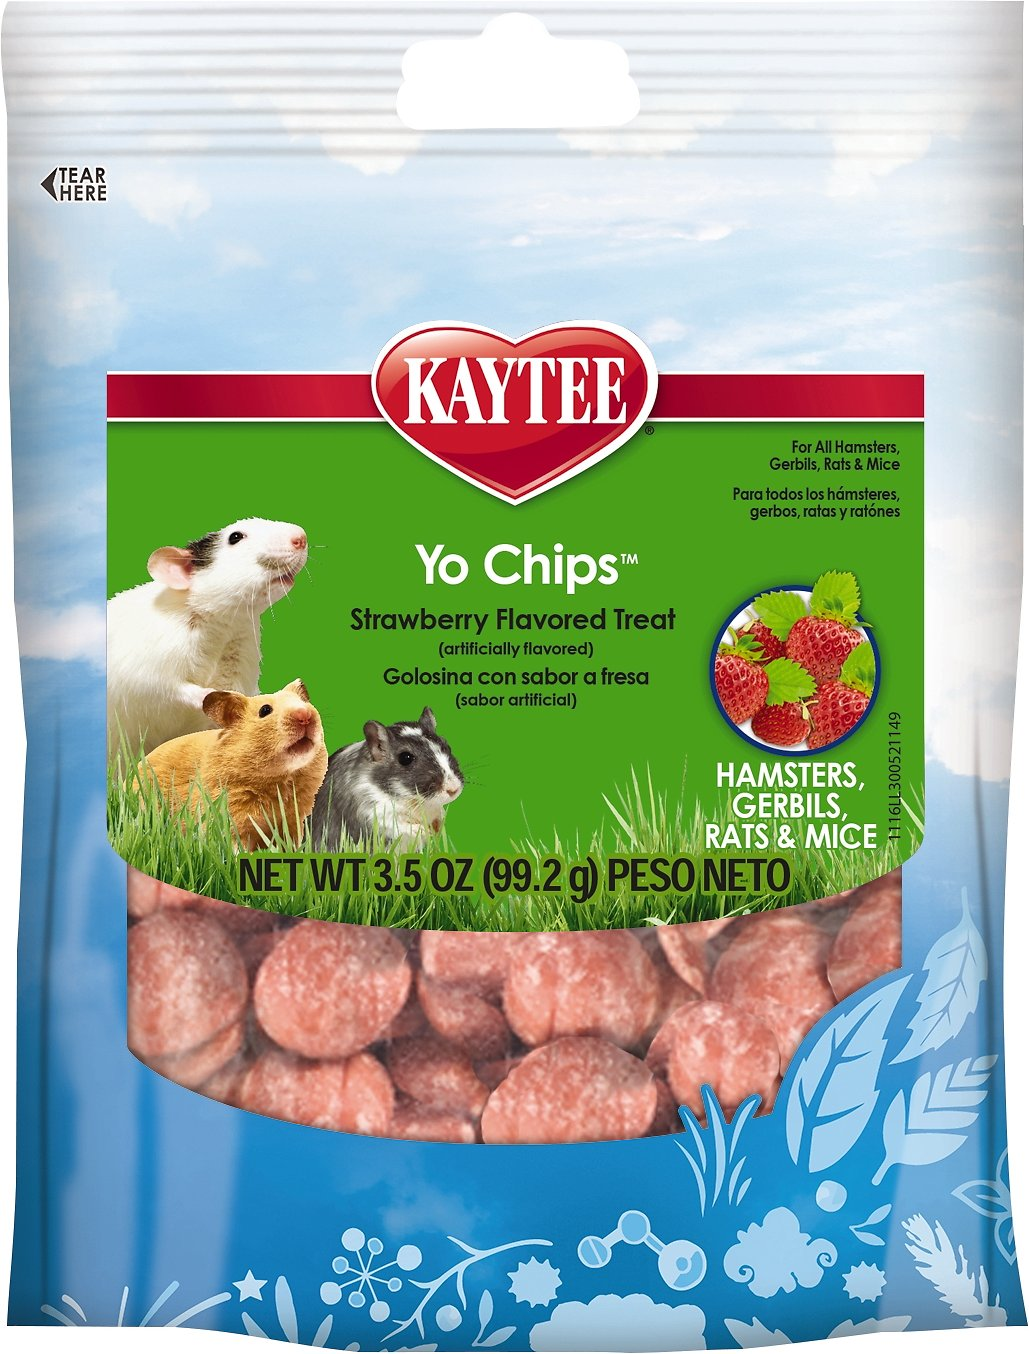 Kaytee Fiesta Strawberry Flavored Yogurt Chips Small Animal Treats, 3.5-oz bag